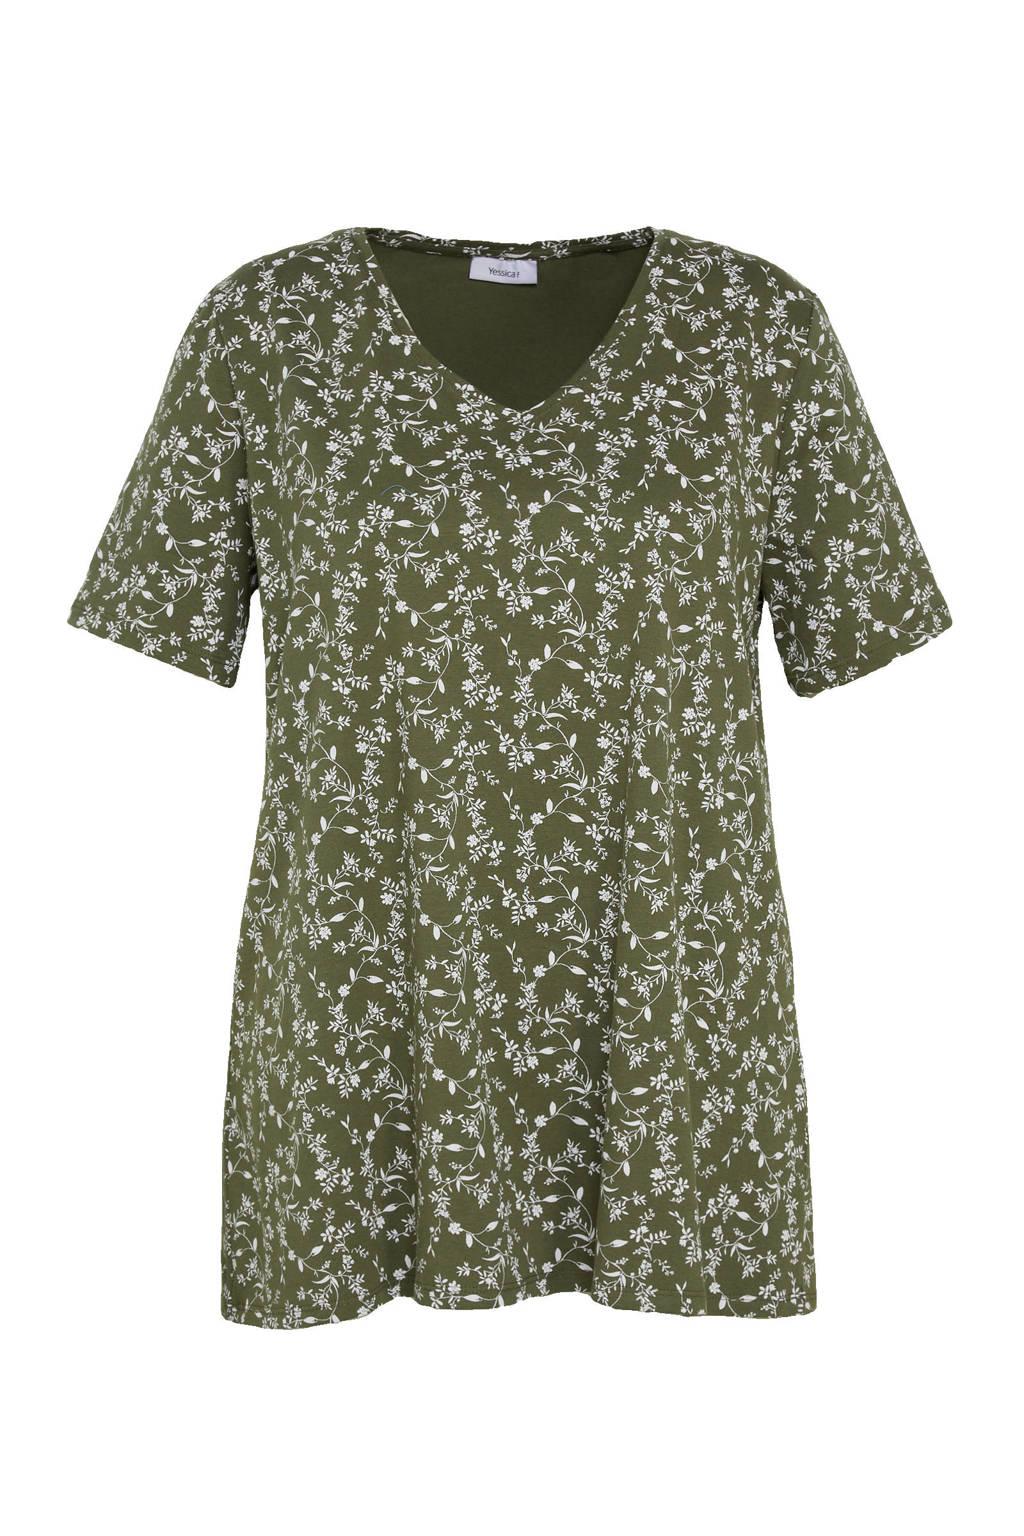 C&A XL Yessica gebloemd T-shirt met biologisch katoen kaki, Kaki